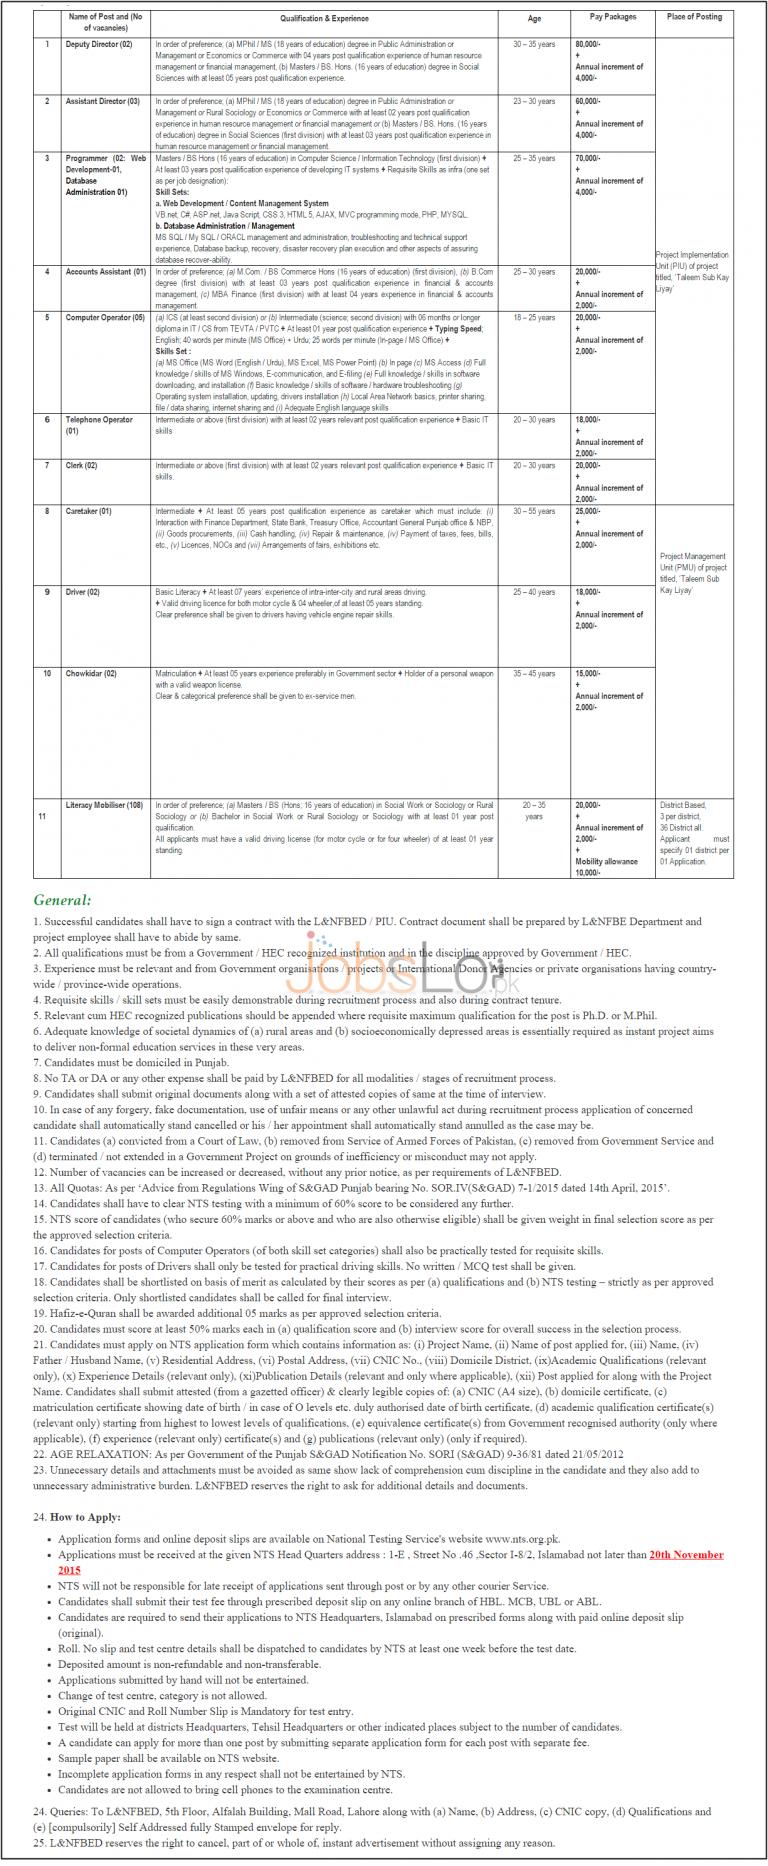 Literacy & Non Formal Basic Education NTS Jobs 2015 November Advertisement